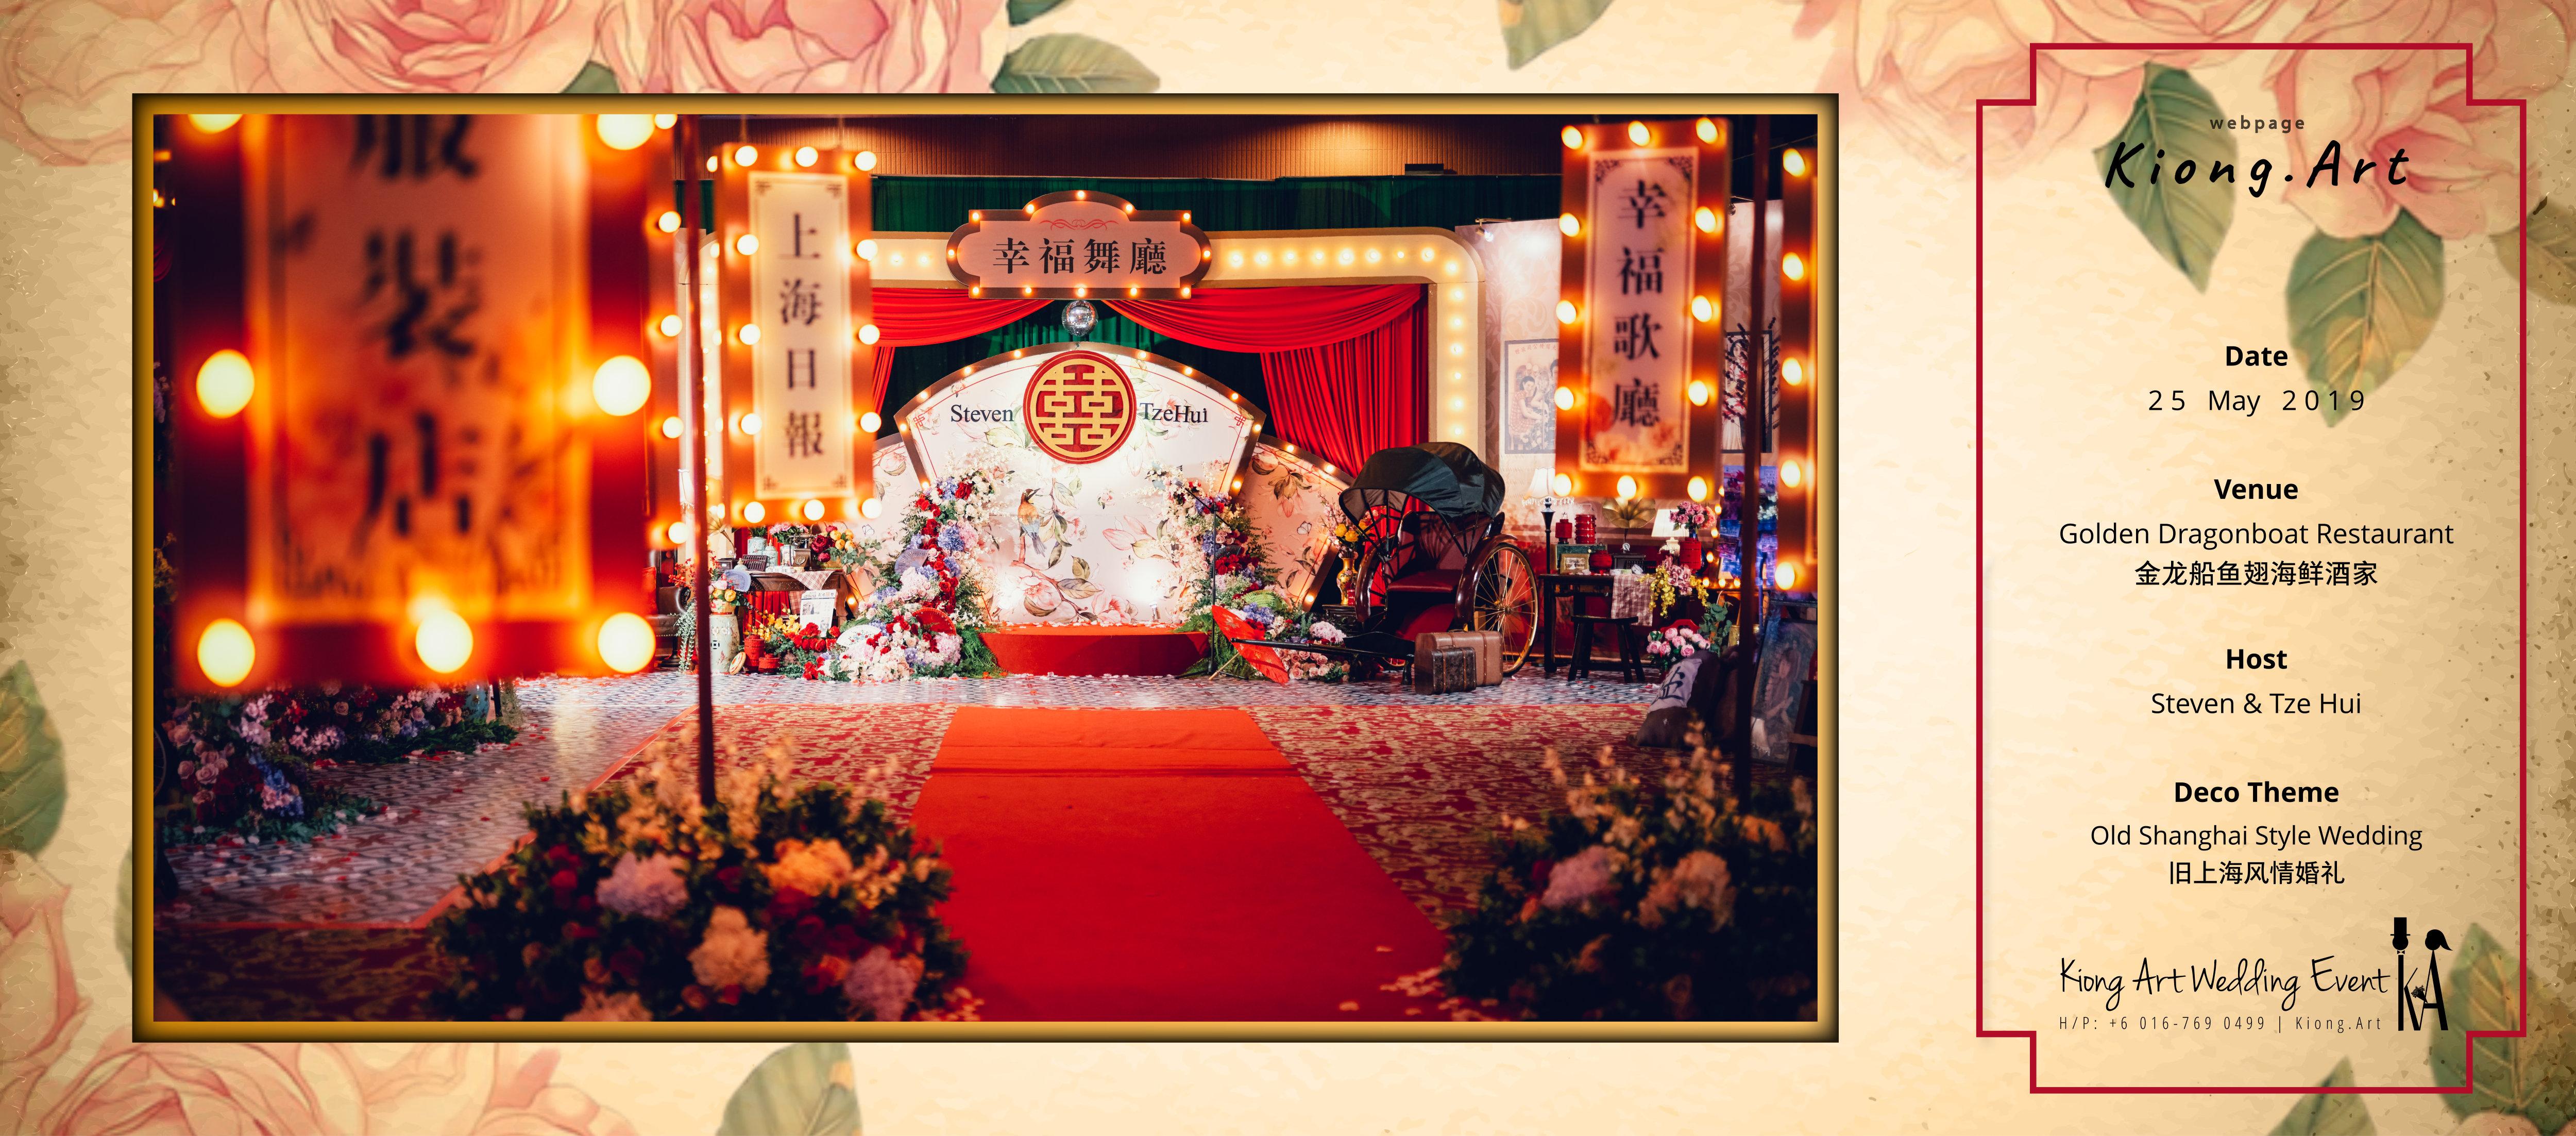 Kuala Lumpur Wedding Deco Decoration Kiong Art Wedding Deco Old Shanghai Style Wedding 旧上海风情婚礼 Steven and Tze Hui at Golden Dragonboat Restaurant 金龙船鱼翅海鲜酒家 Malaysia A16-B00-001